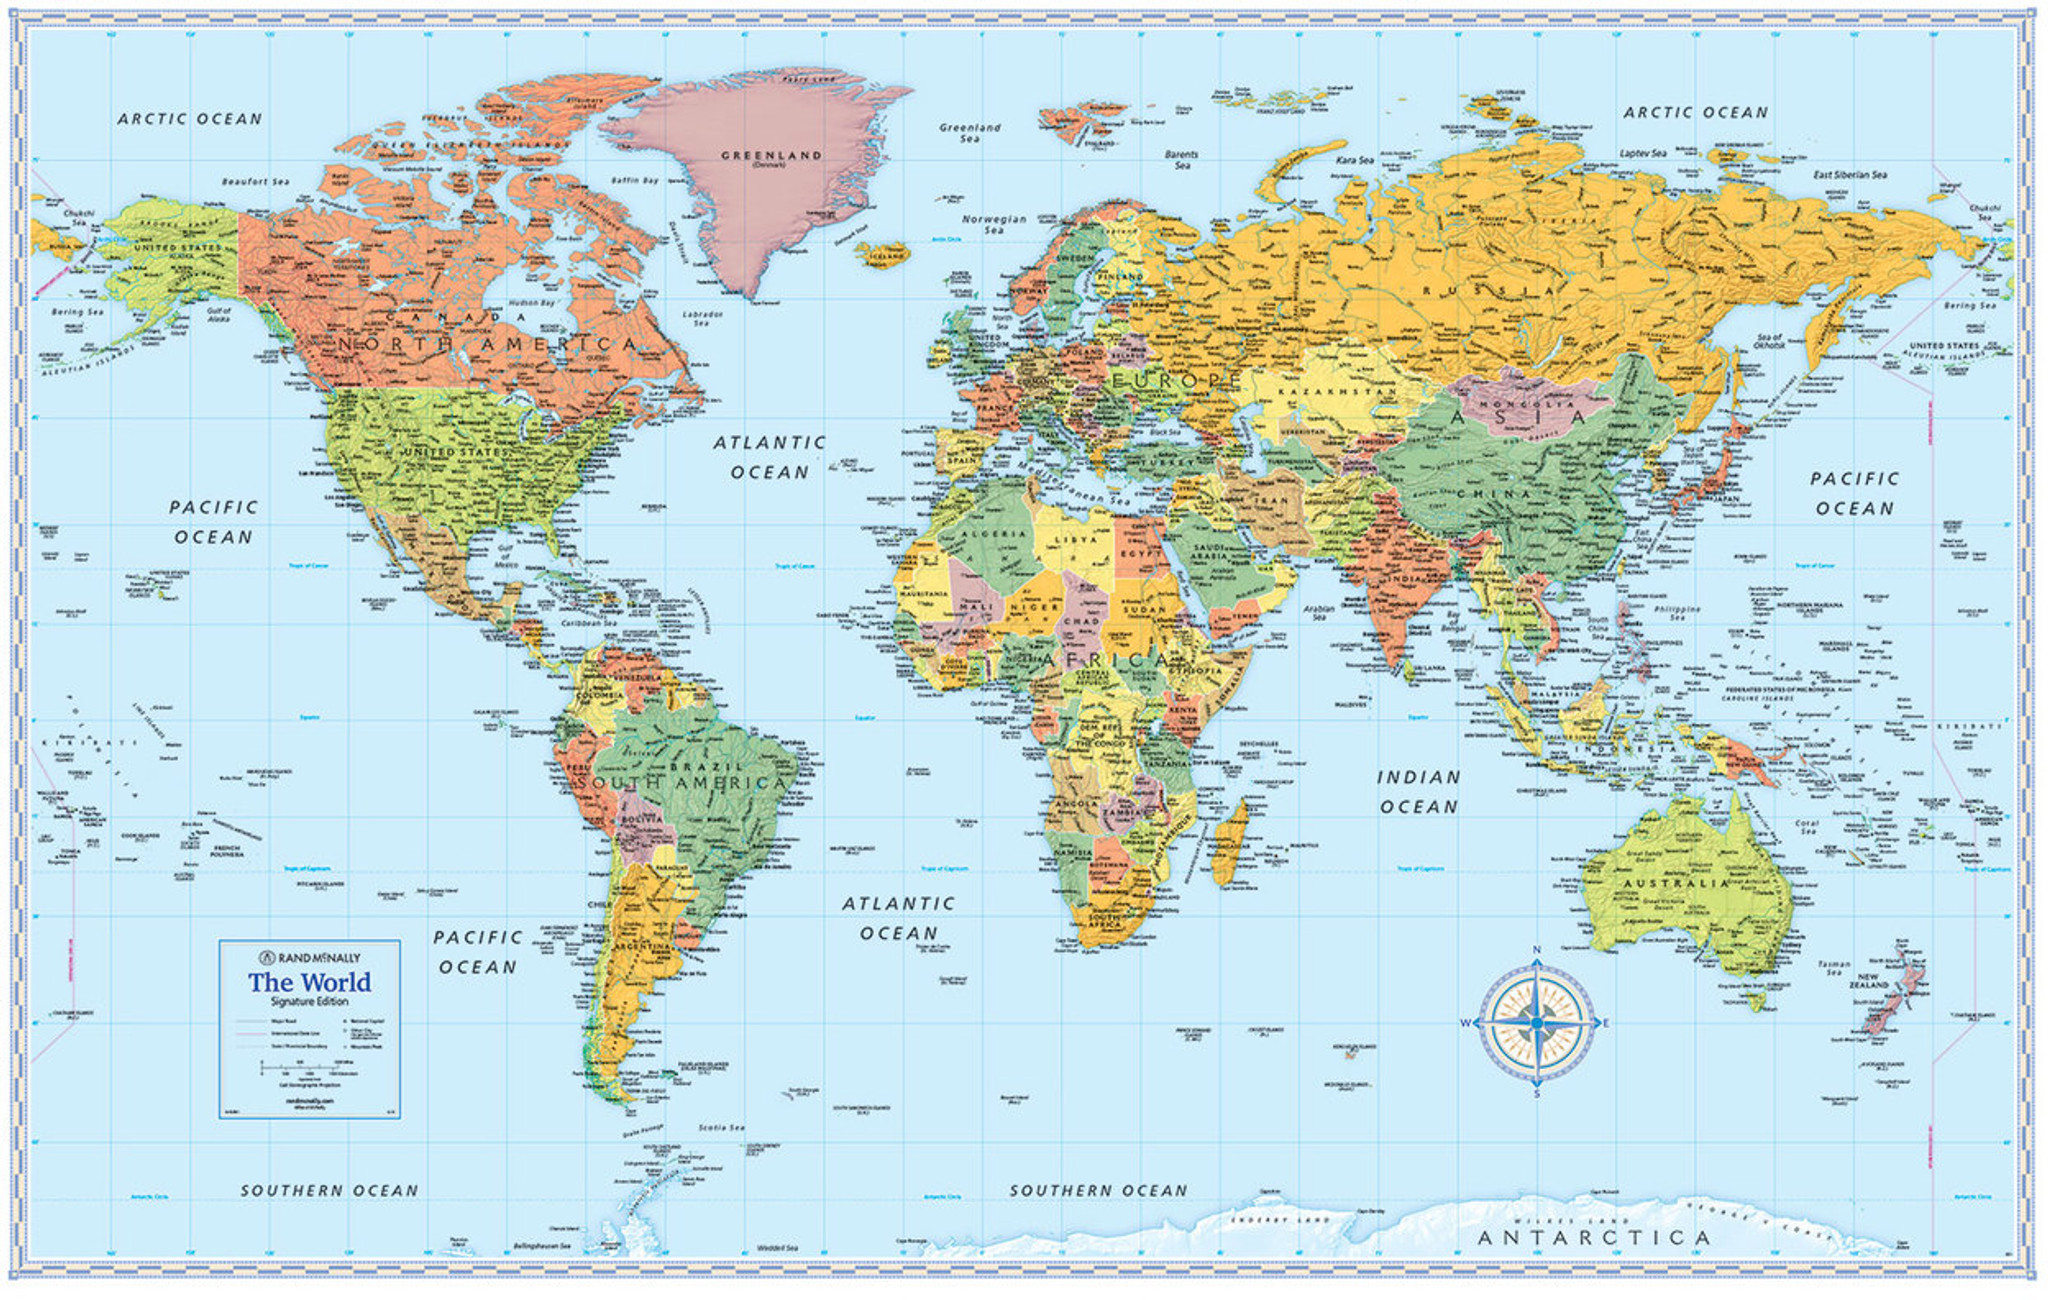 Classic Edition World Wall Maps Rand McNally Store - Rand mcnally us wall map